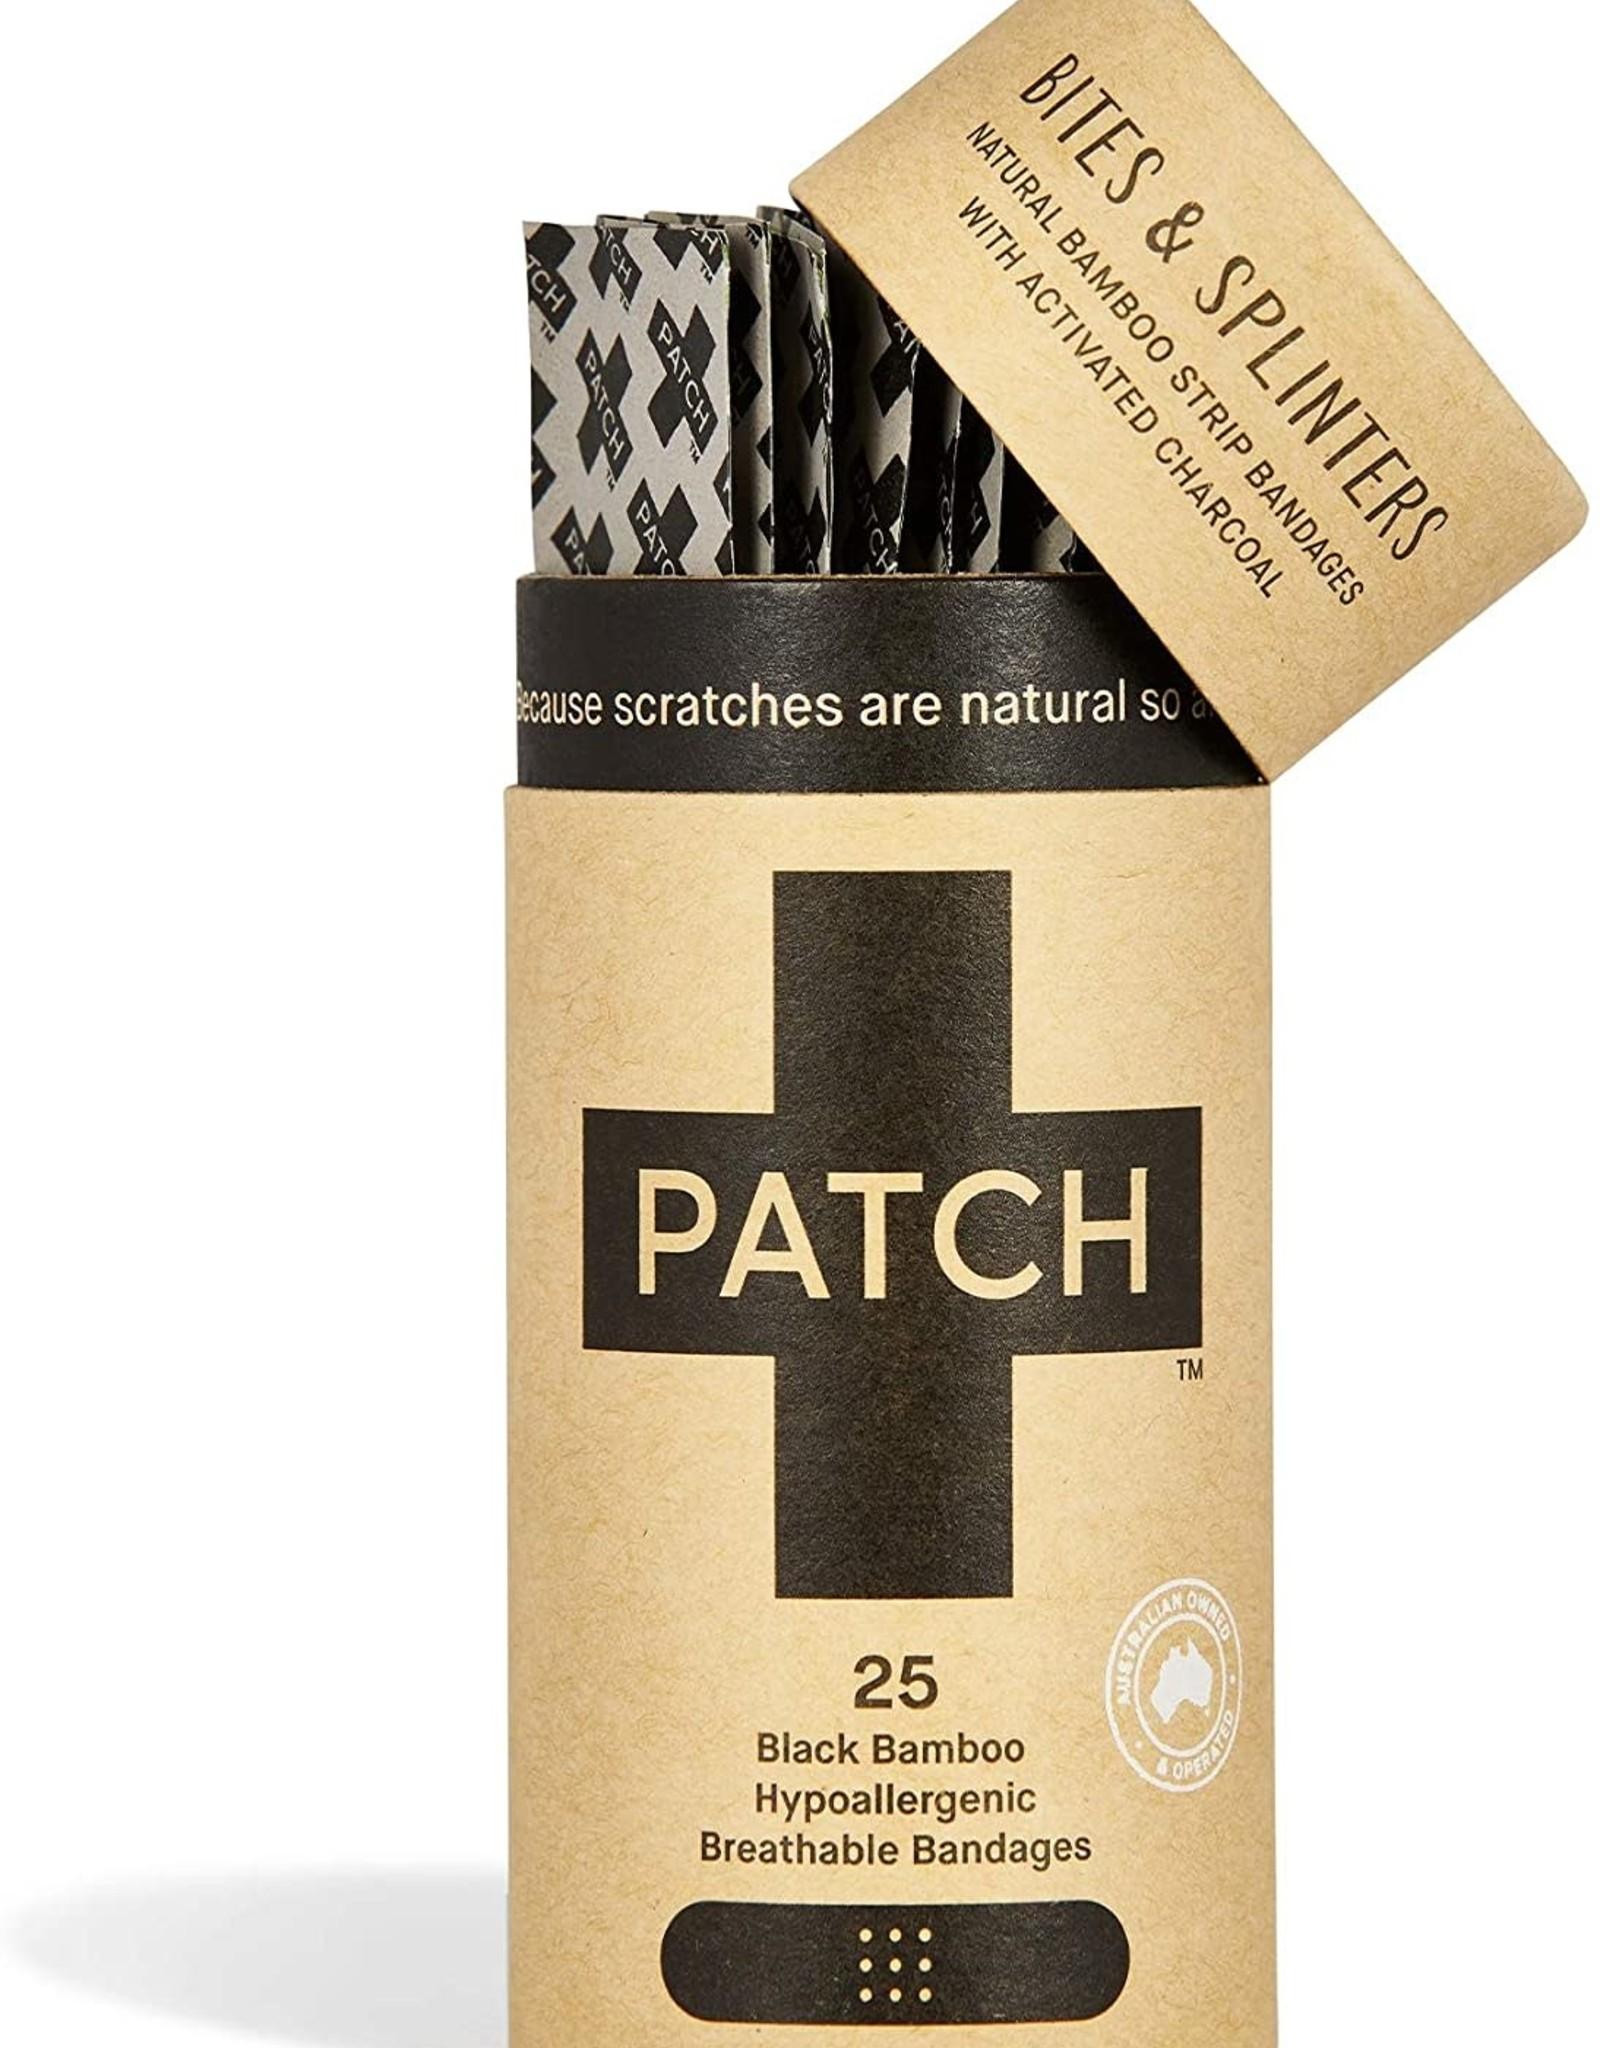 Patch Patch Bandage